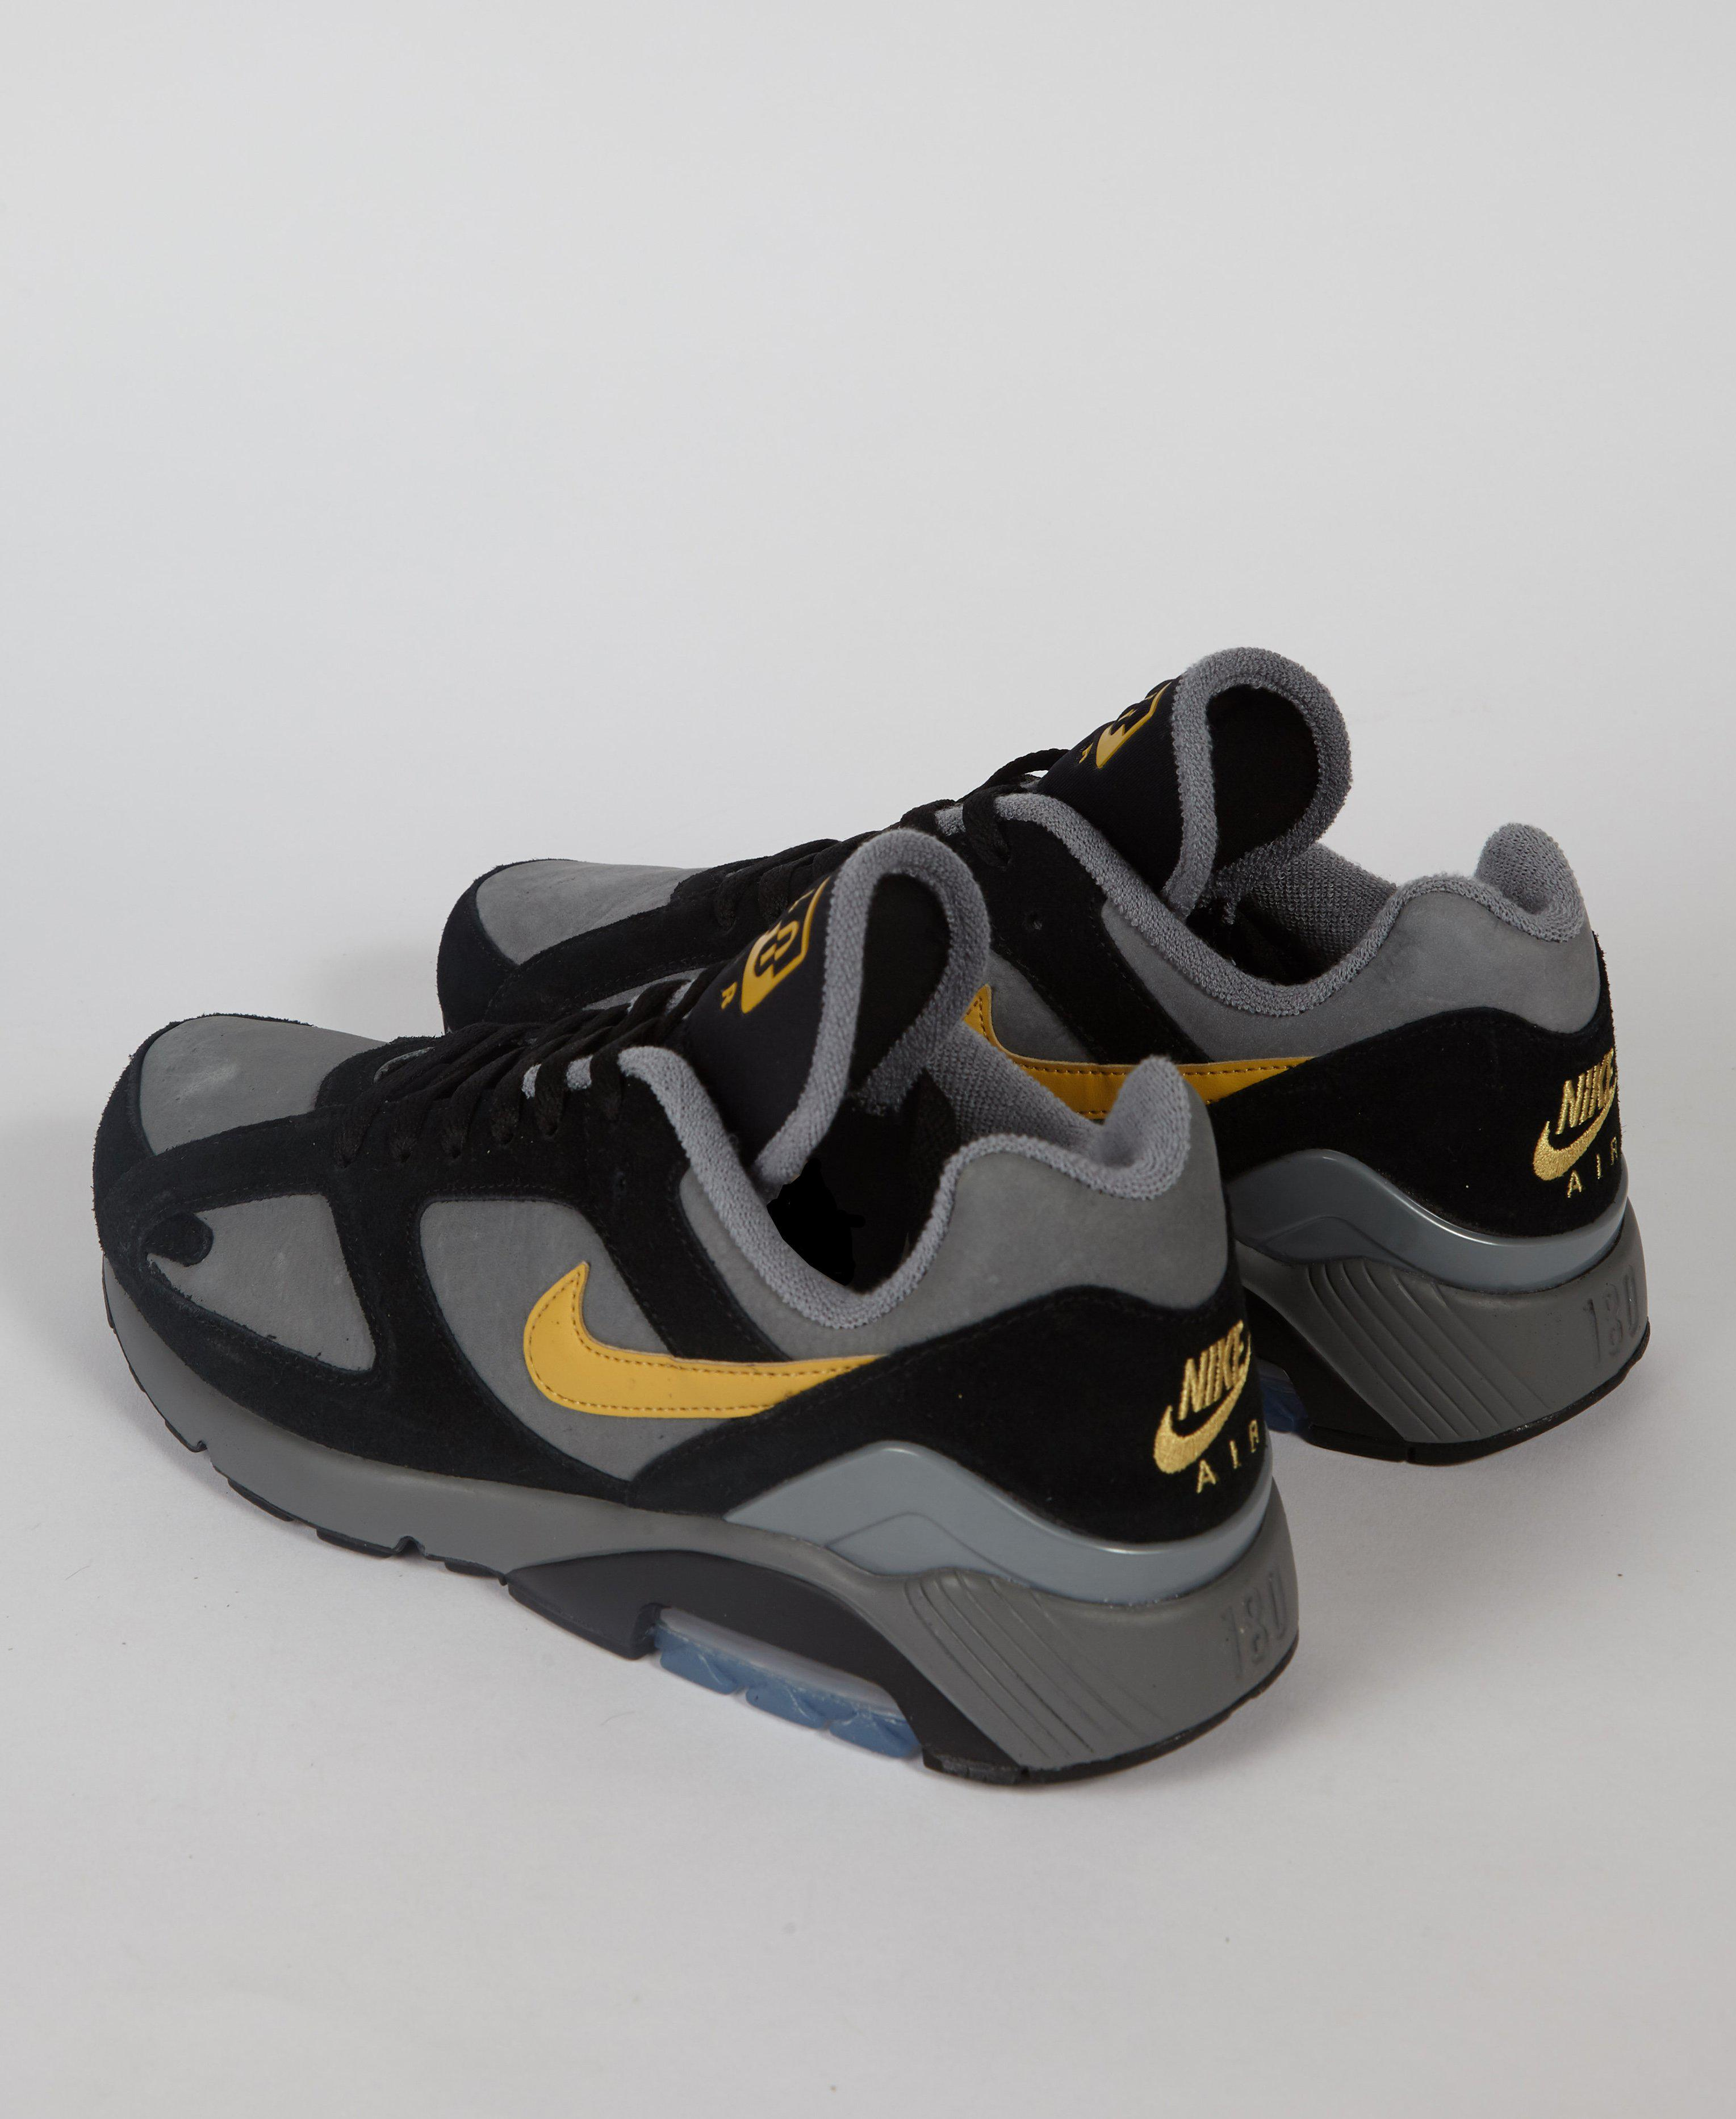 58af8a5b61c Lyst - Nike Air Max 180 Cool Grey   Black   Gold in Black for Men